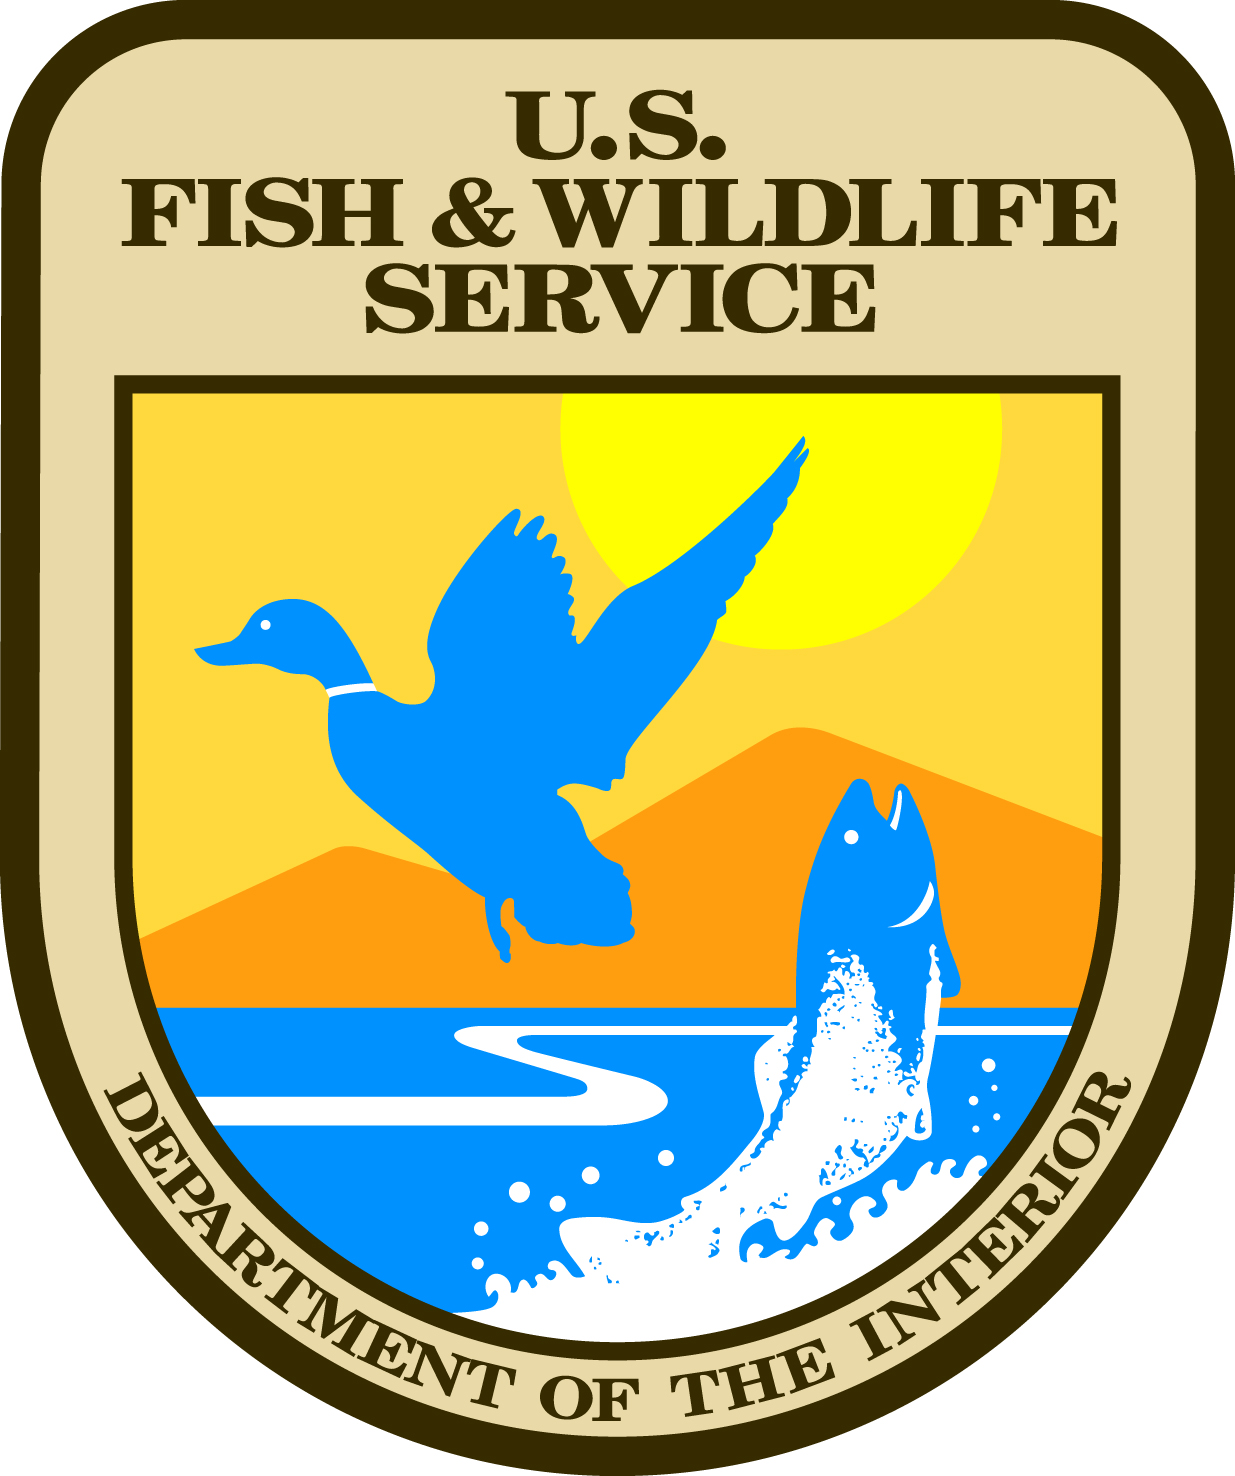 Fish & Wildlife Services